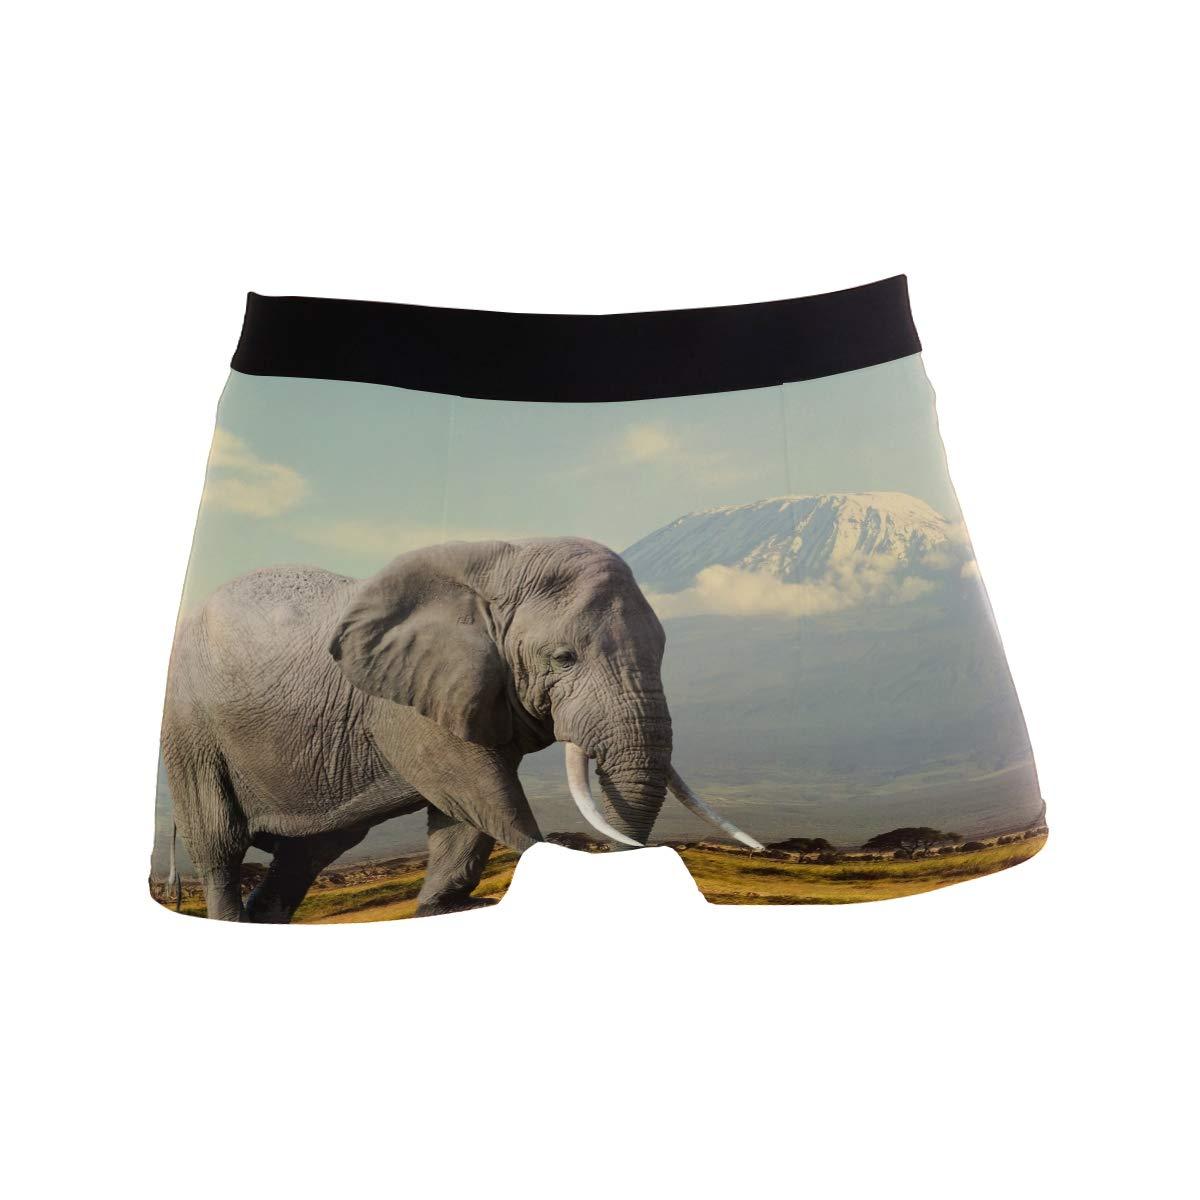 ZZKKO Walking Elephant Mens Boxer Briefs Underwear Breathable Stretch Boxer Trunk with Pouch S-XL